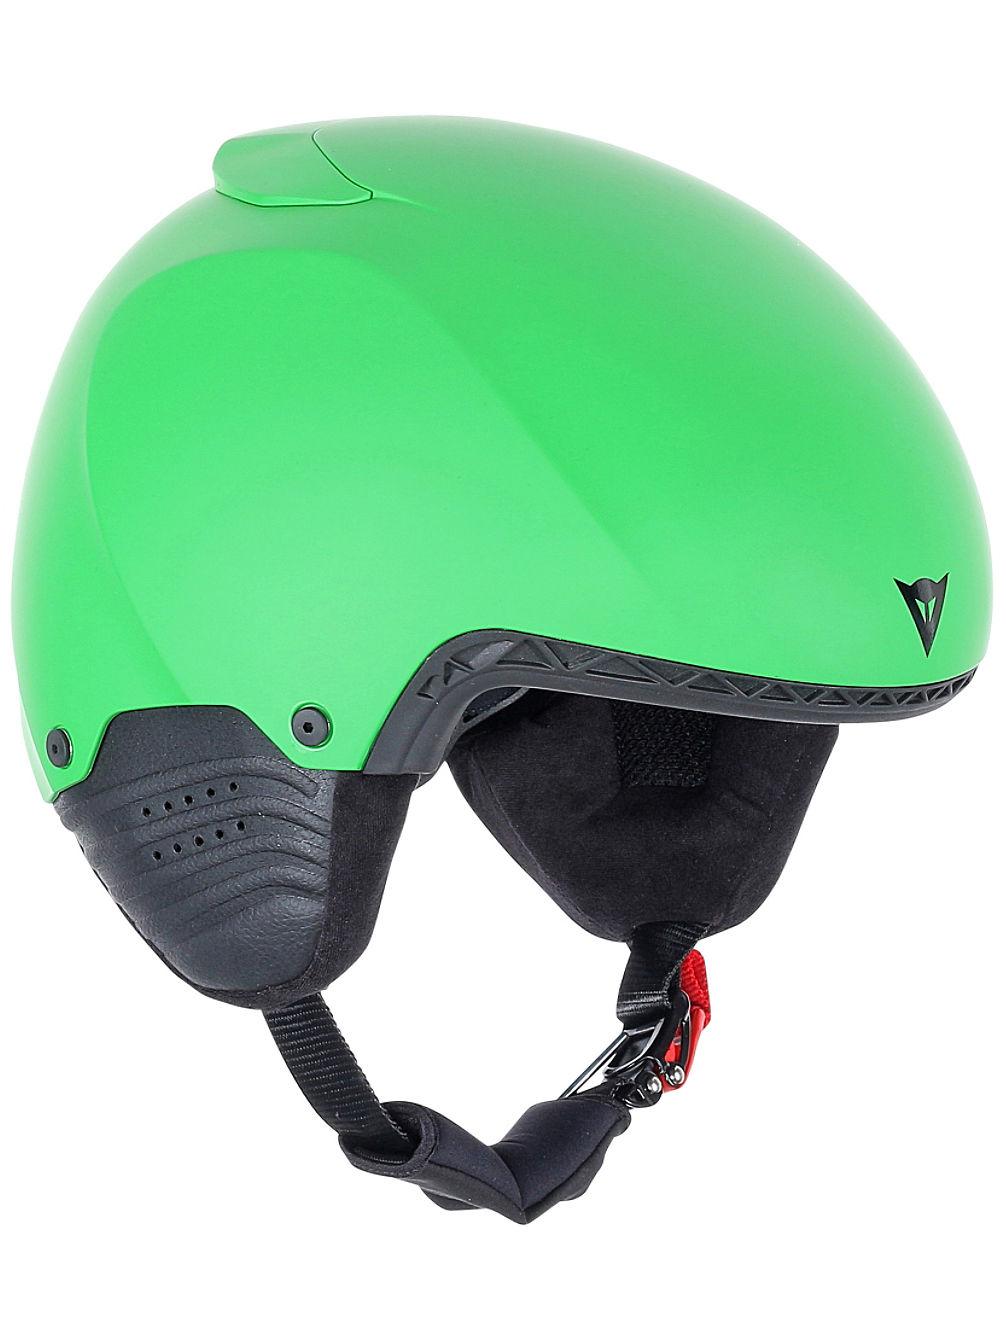 dainese-gt-rapid-evo-helmet